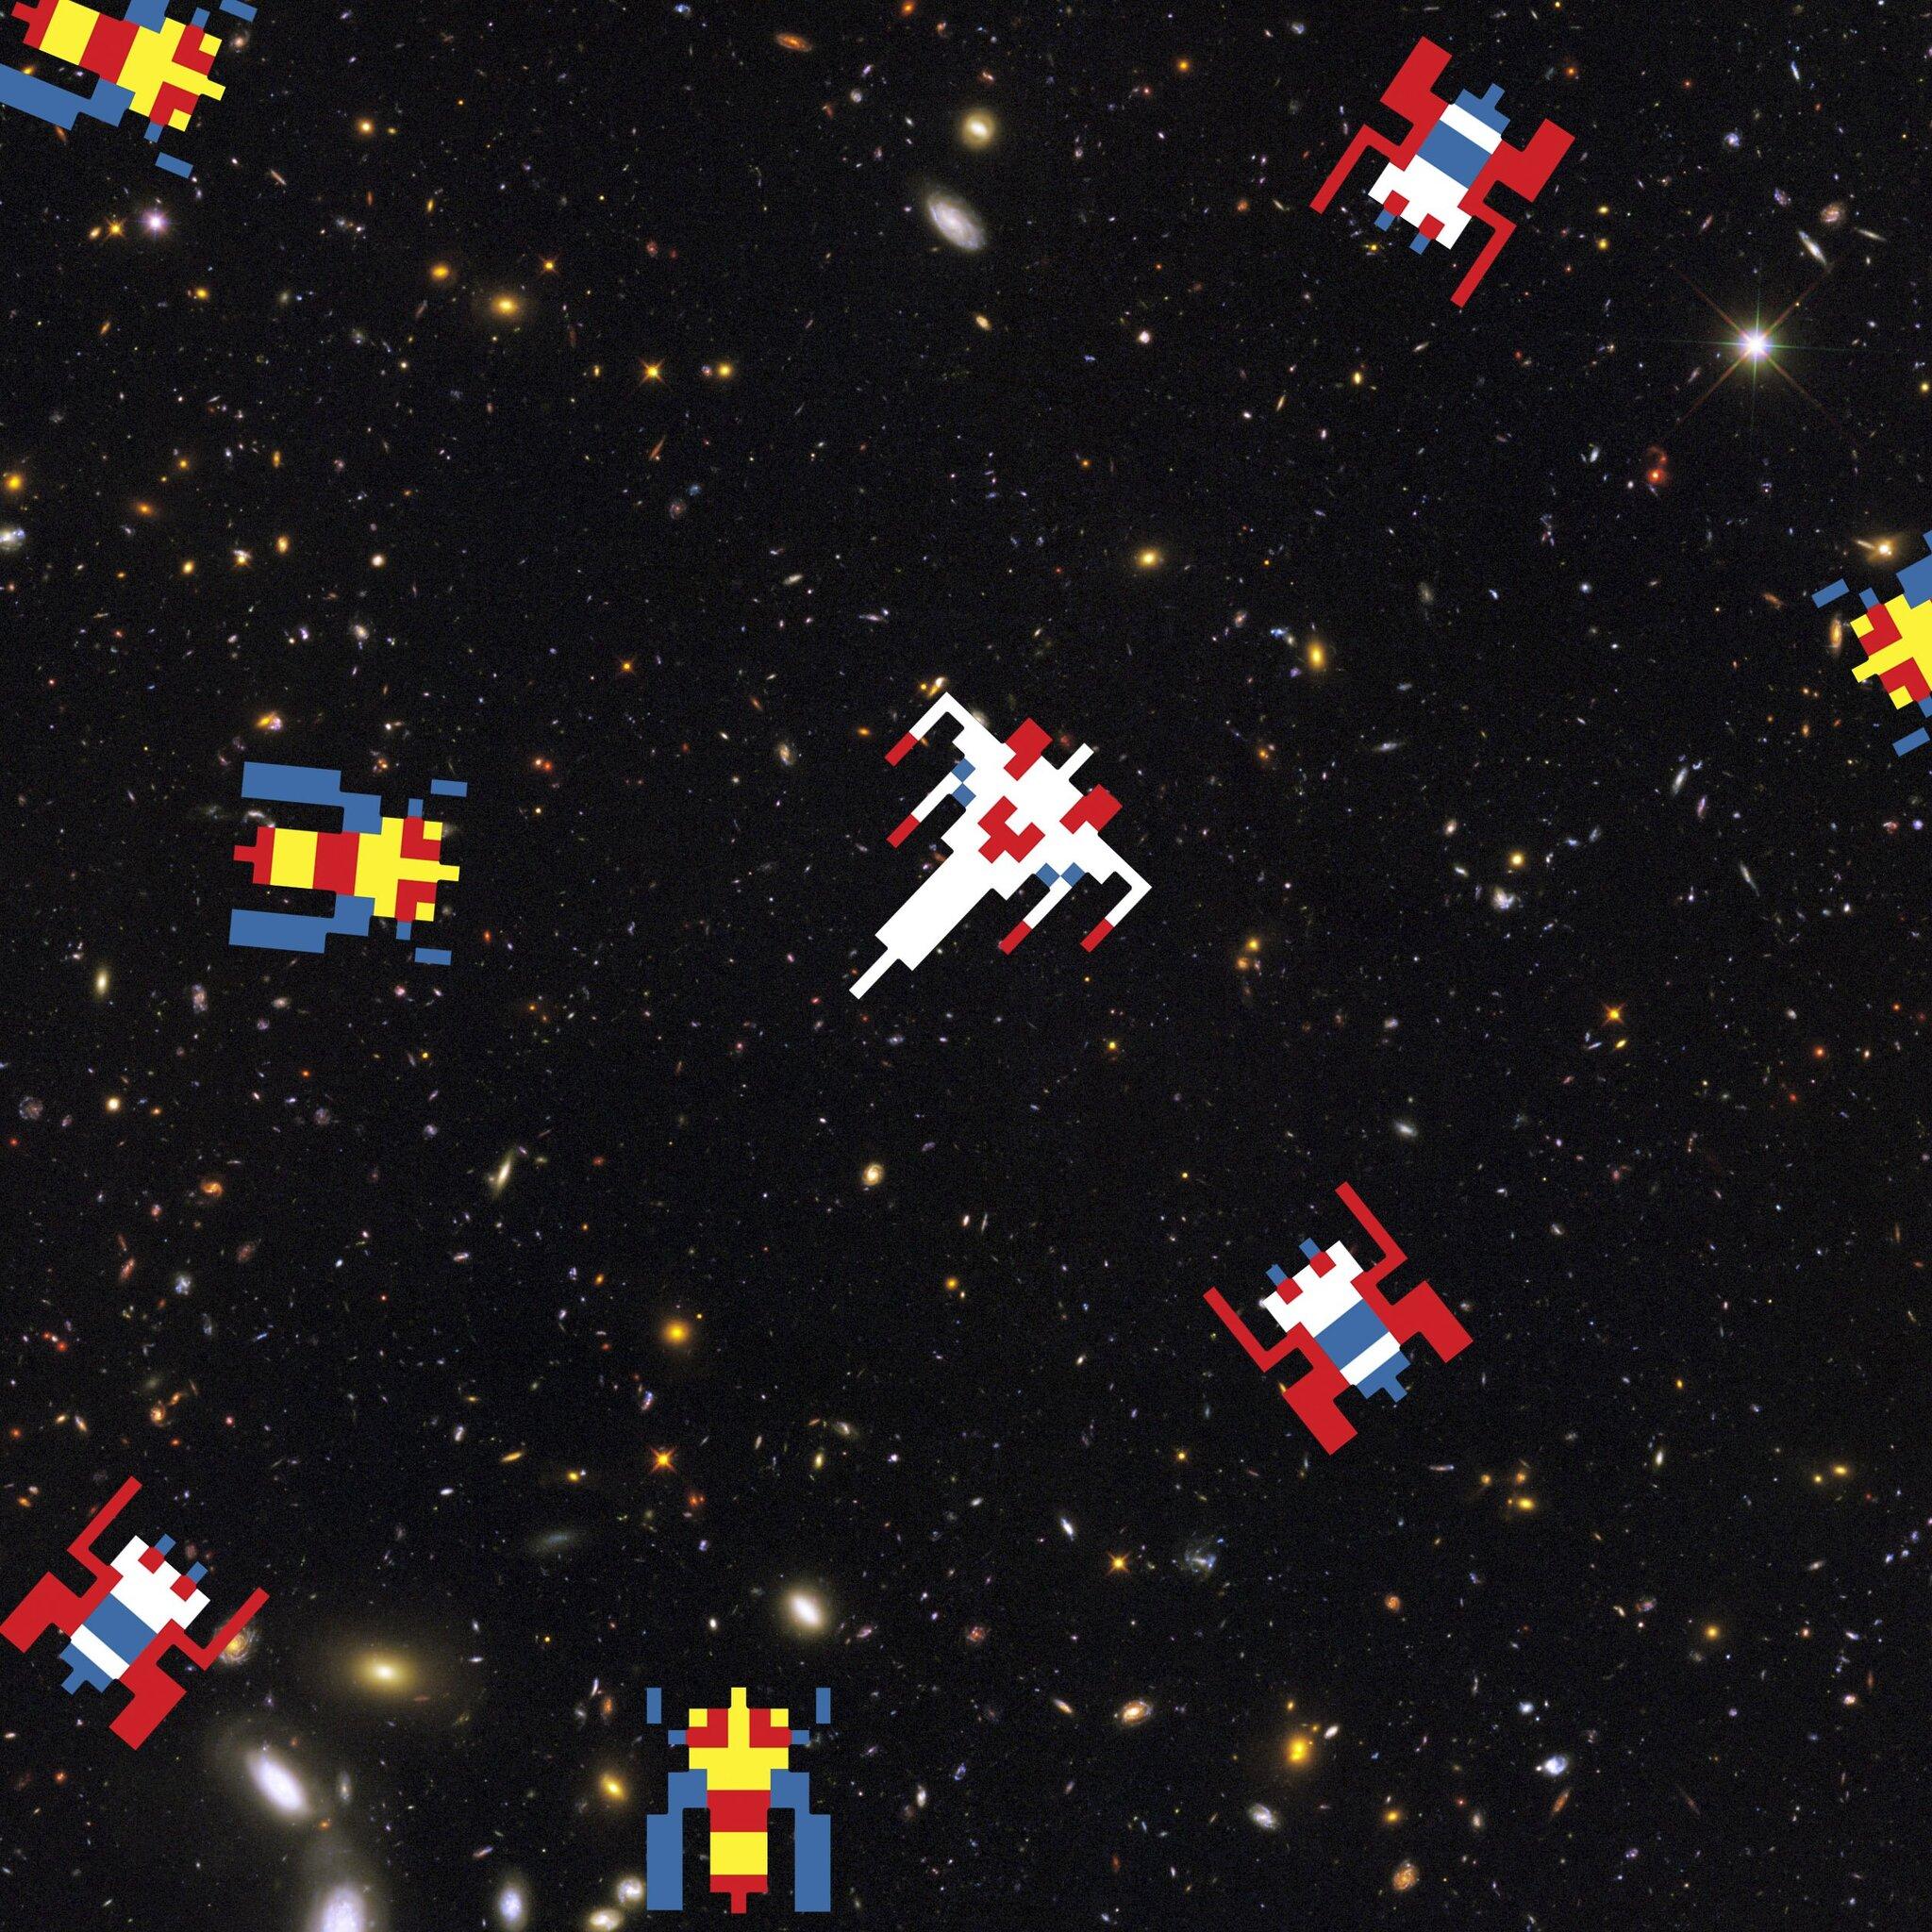 shooter-spaceships-scifi-arcade-8p.jpg